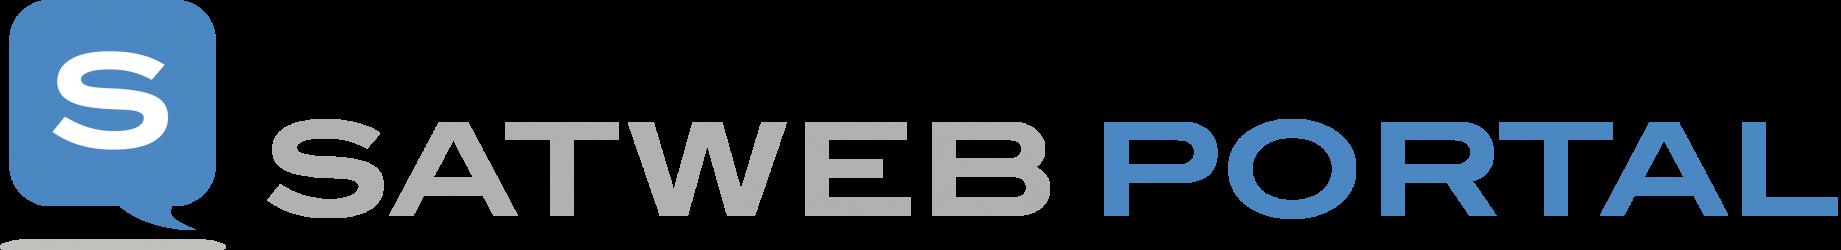 SatWeb Portal